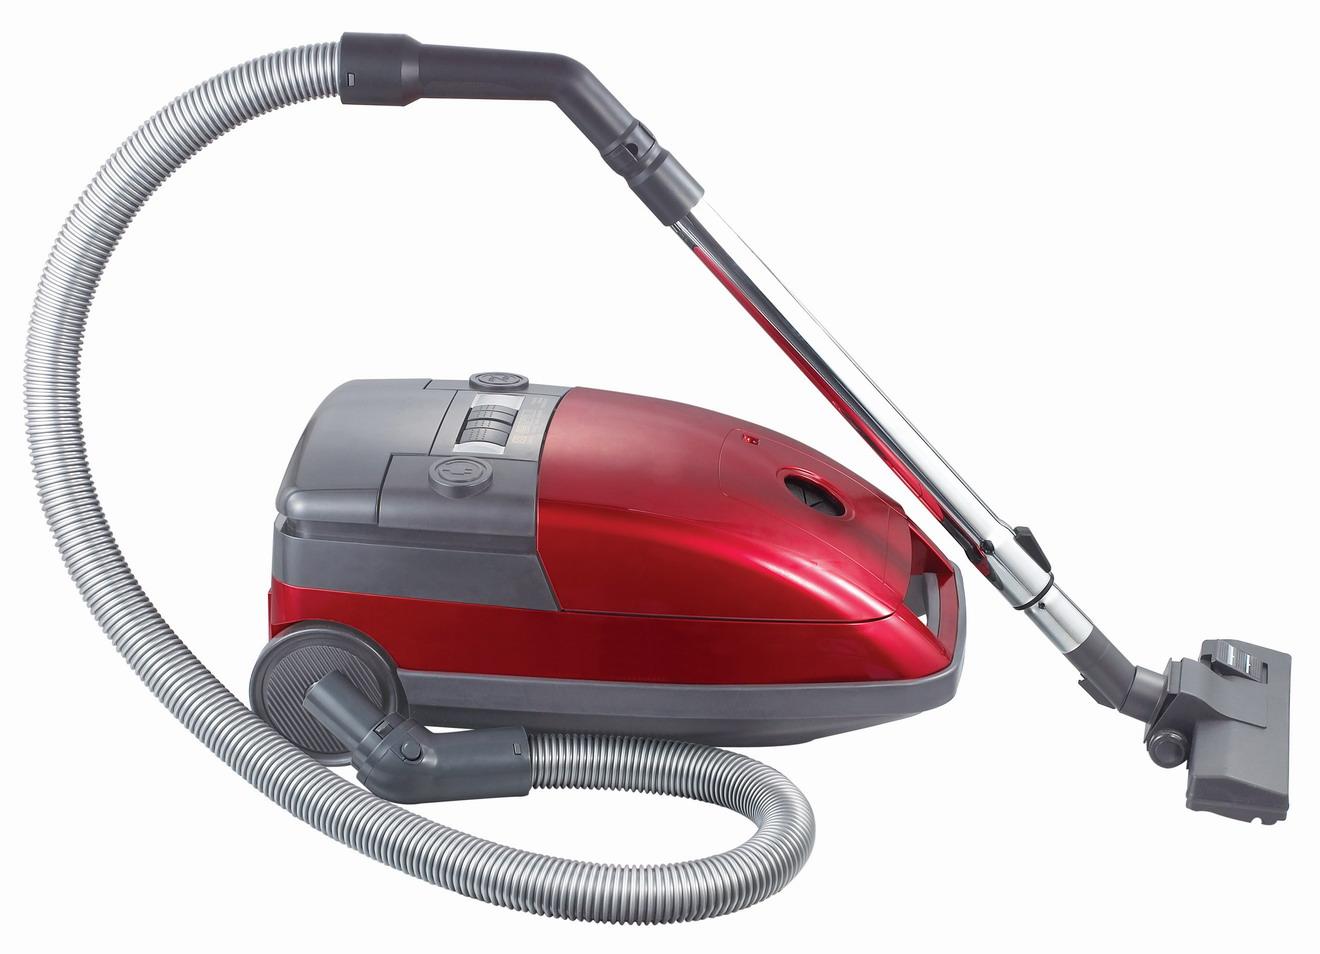 Vacuum Cleaner Repair (Image 9 of 10)